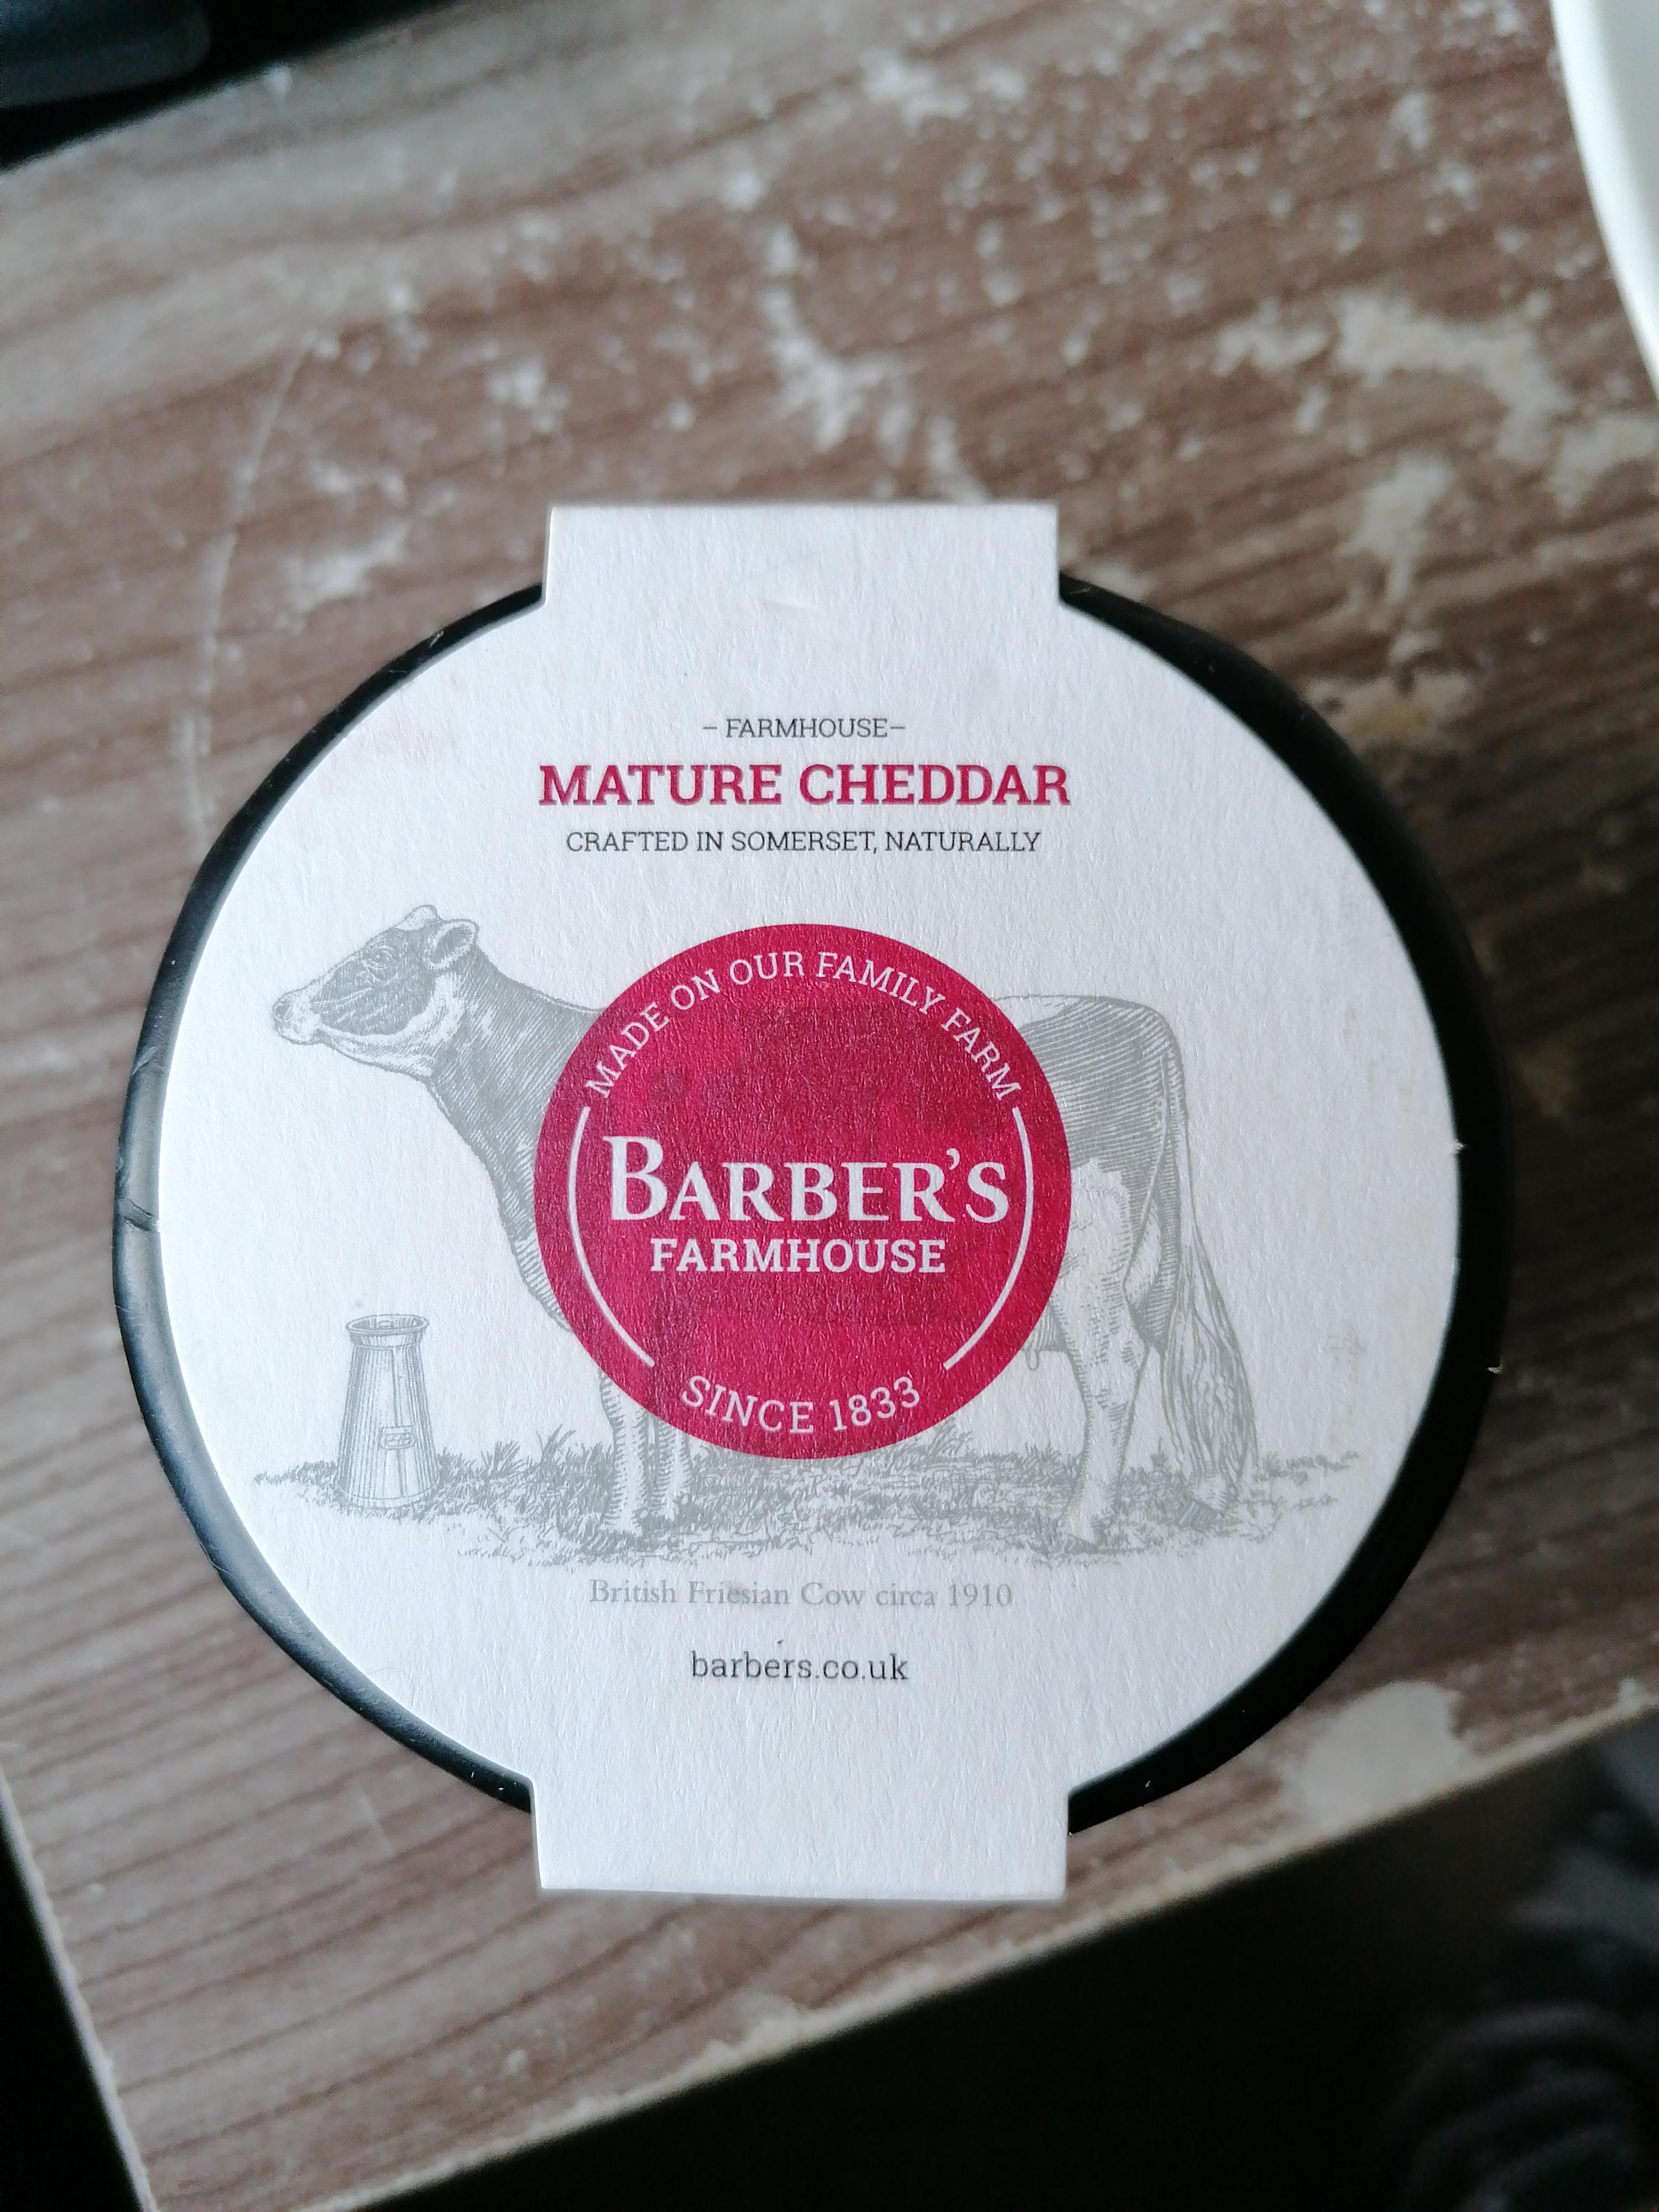 Barber's Farmhouse Mature Cheddar